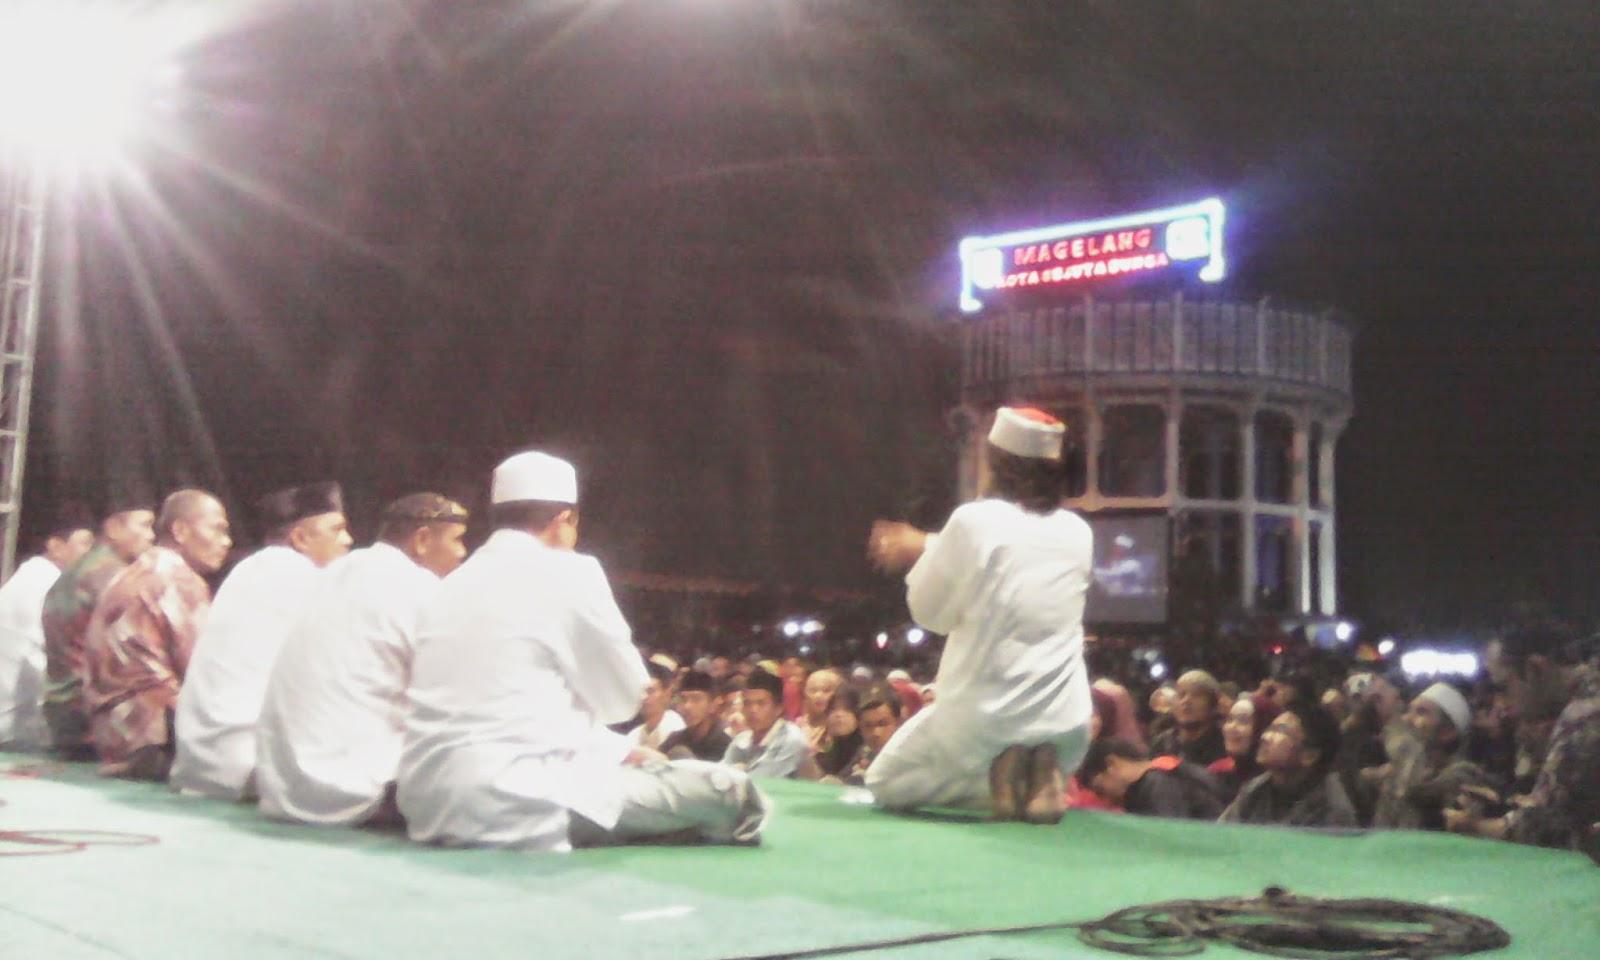 Magelang berdoa bersama Caknun dan Kyai Kanjeng